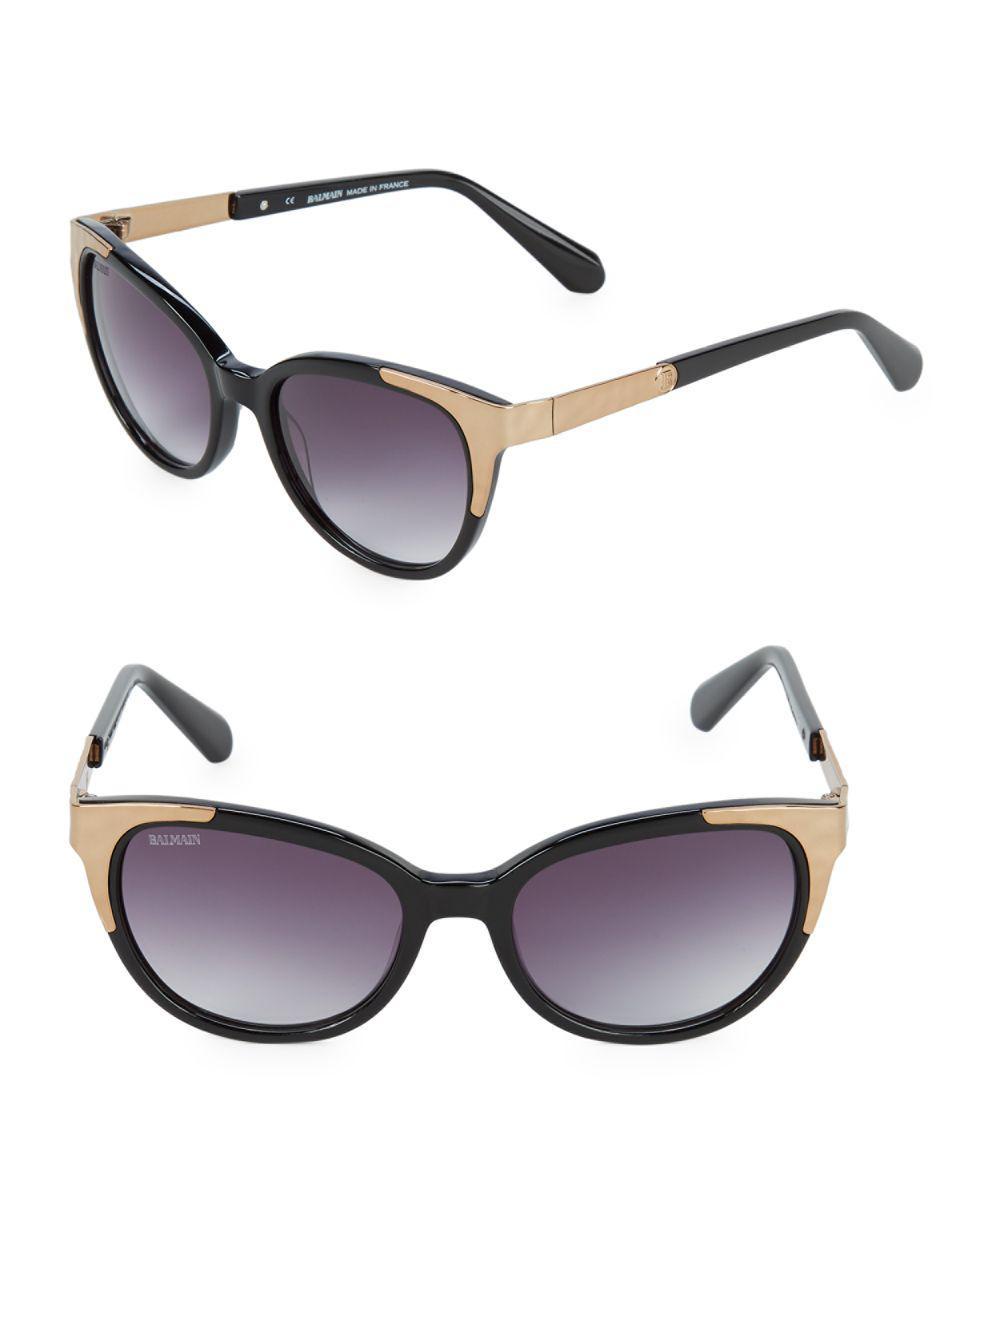 04d6b93113ec Balmain - Black Metallic 53mm Oval Sunglasses - Lyst. View fullscreen